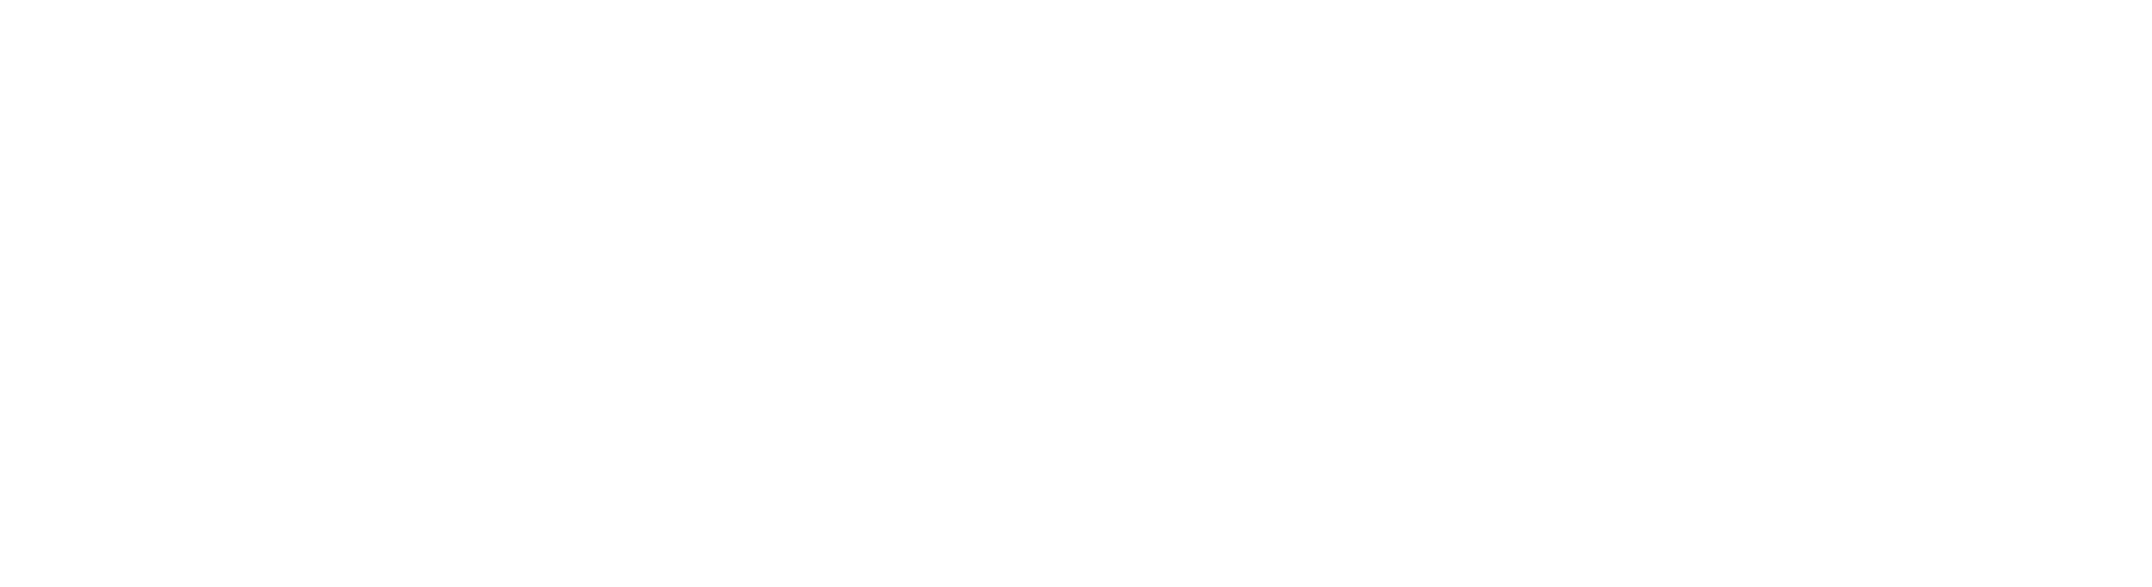 edoc logo weiss